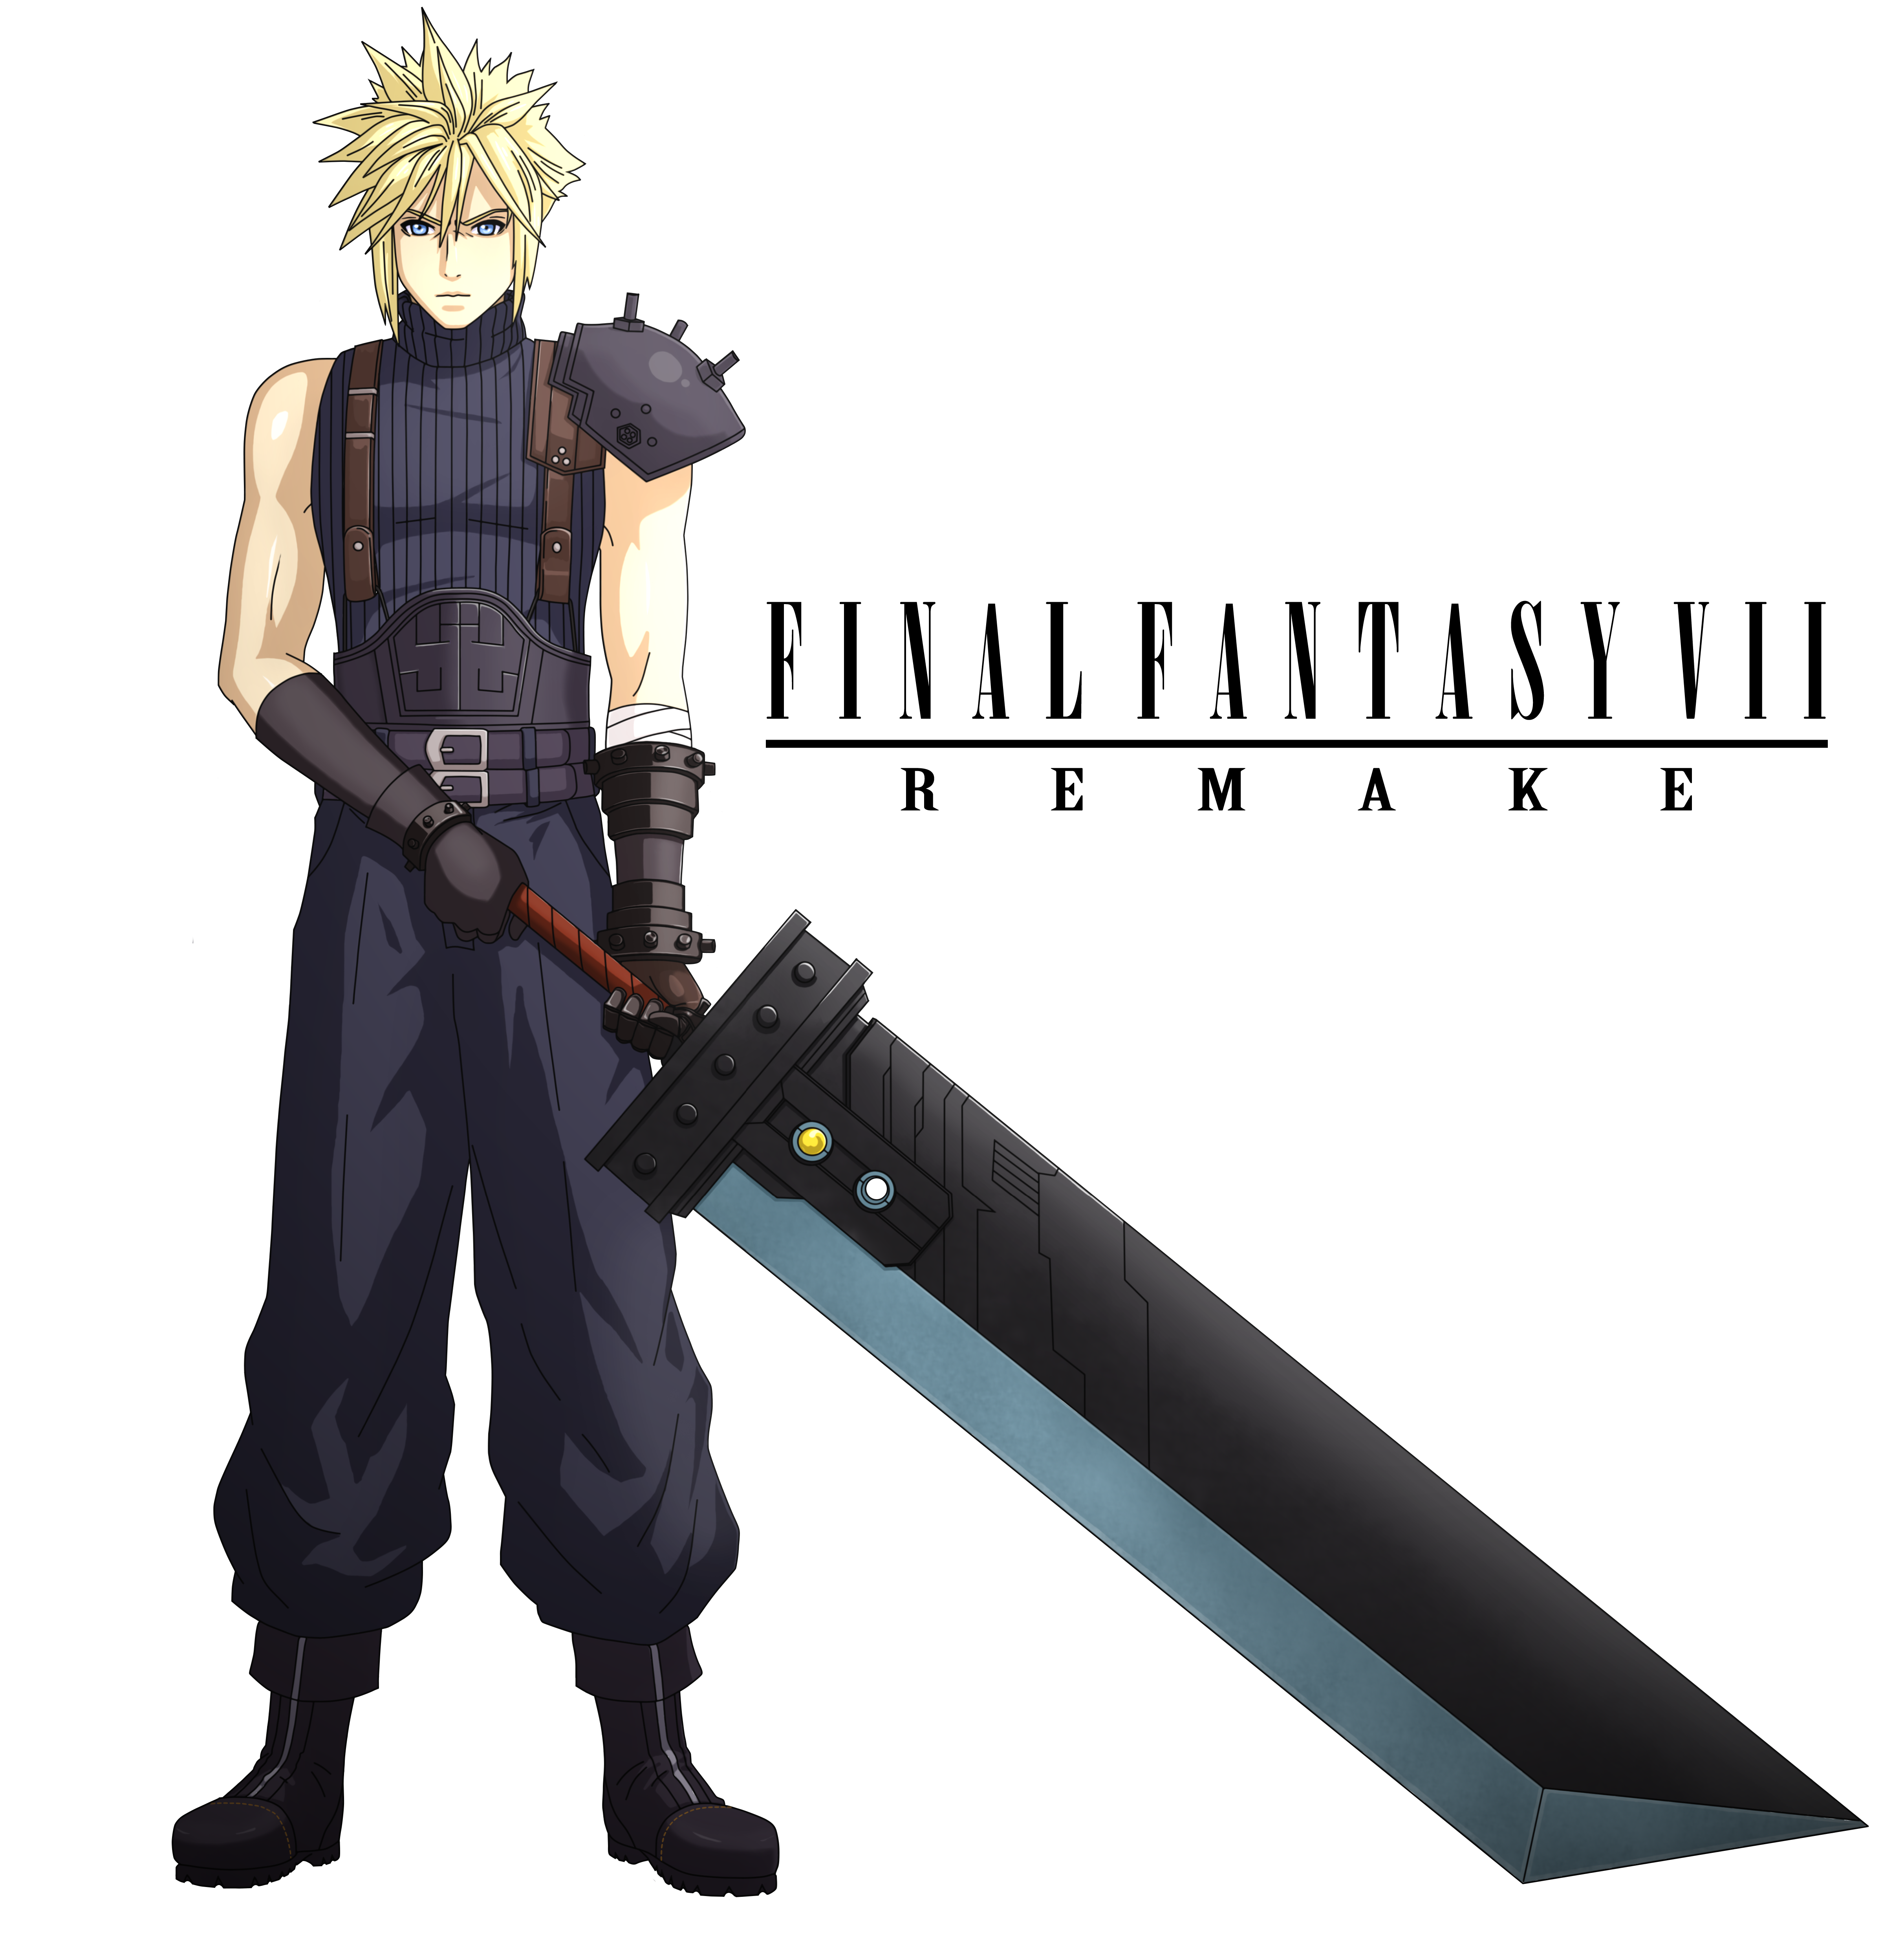 Illustration Final Fantasy Vii Remake Type B Final Fantasy Ilustrasi Final